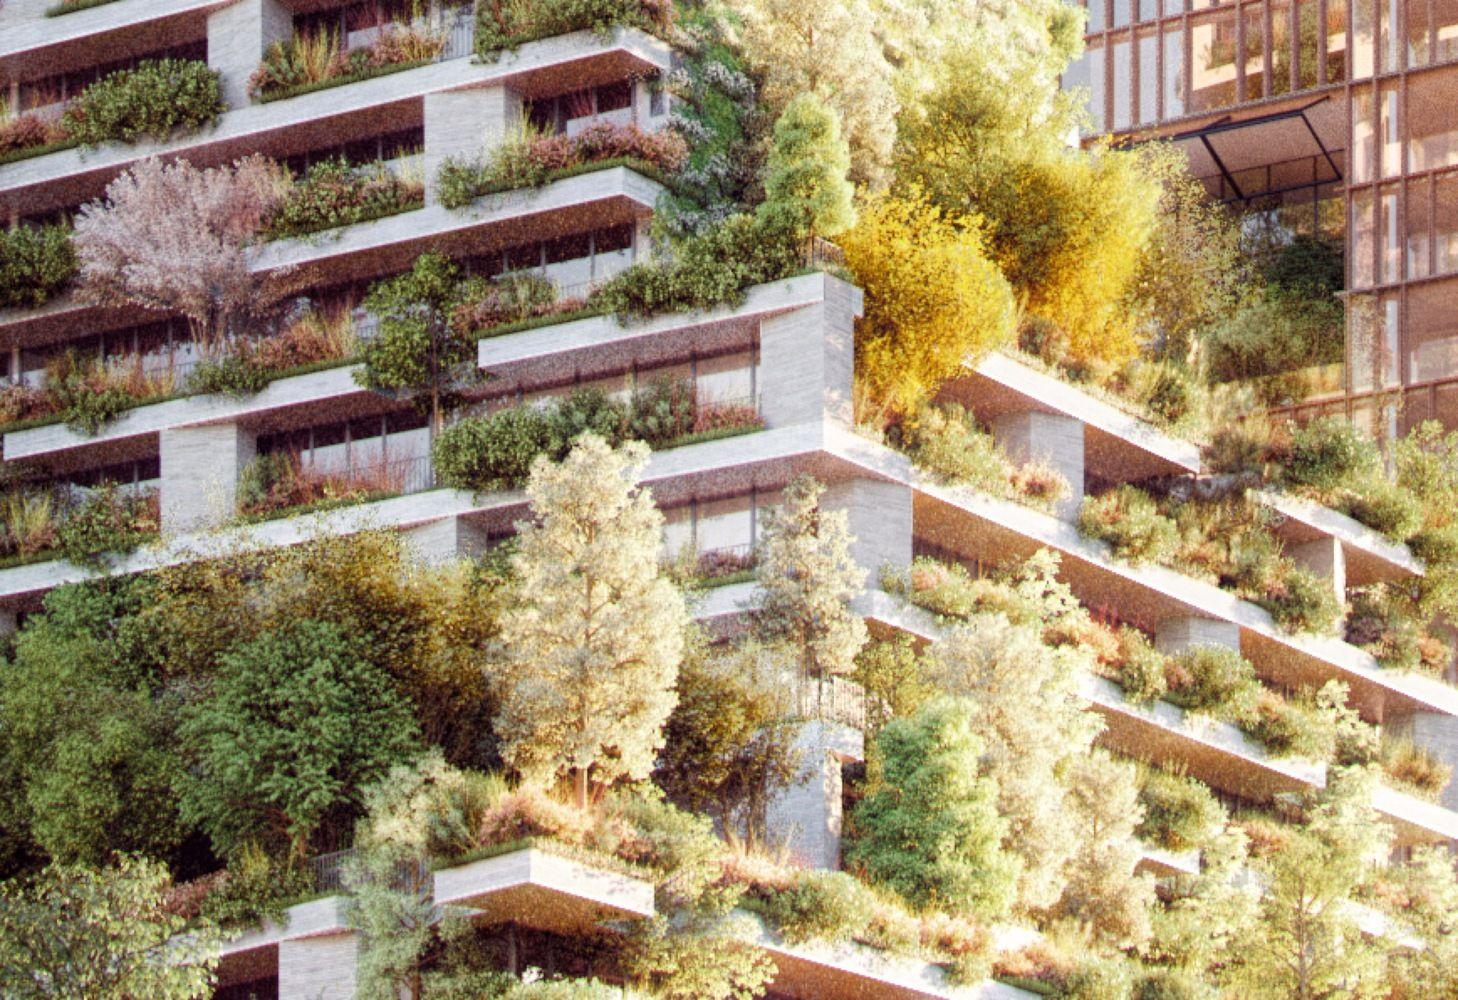 Stefano Boeri Architetti construirá a primeira floresta vertical na Holanda,© Imaginary A2 / Stefano Boeri Architetti